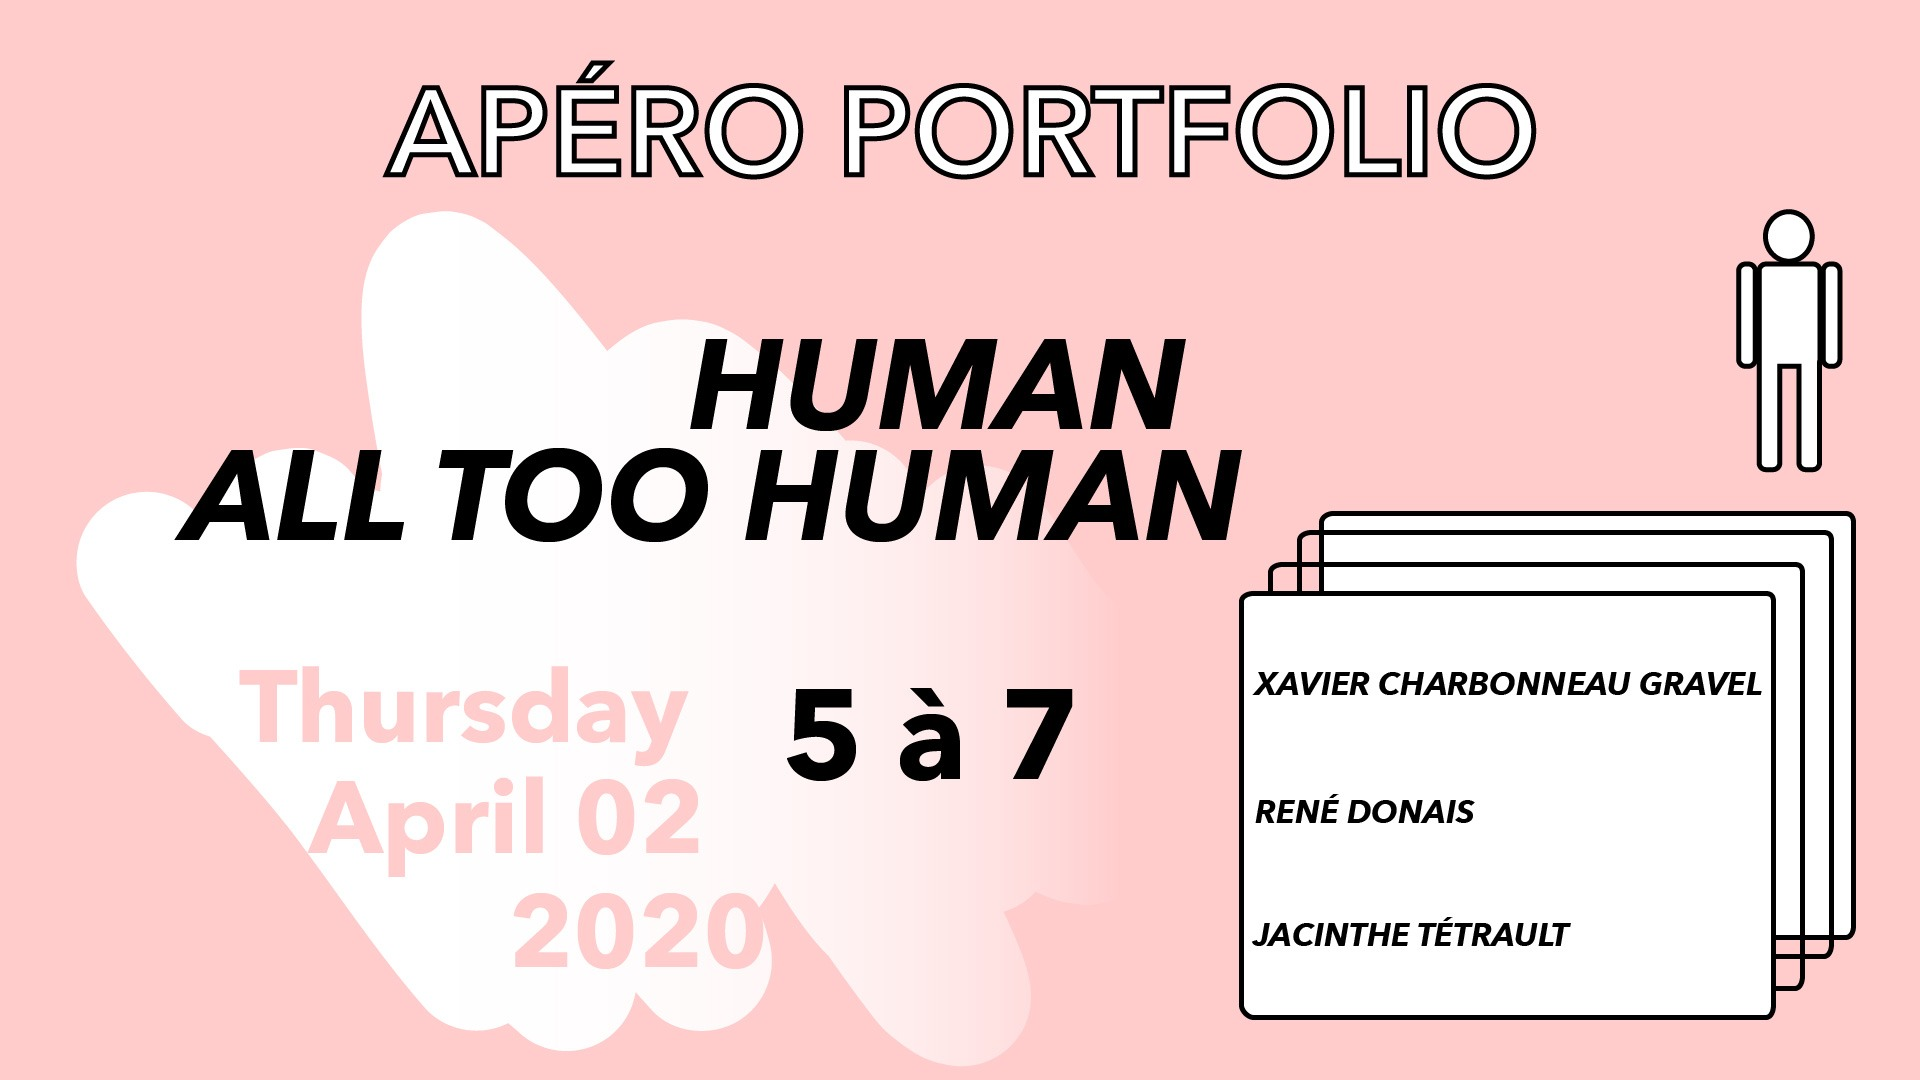 Apero Portfolio: Human, All Too Human